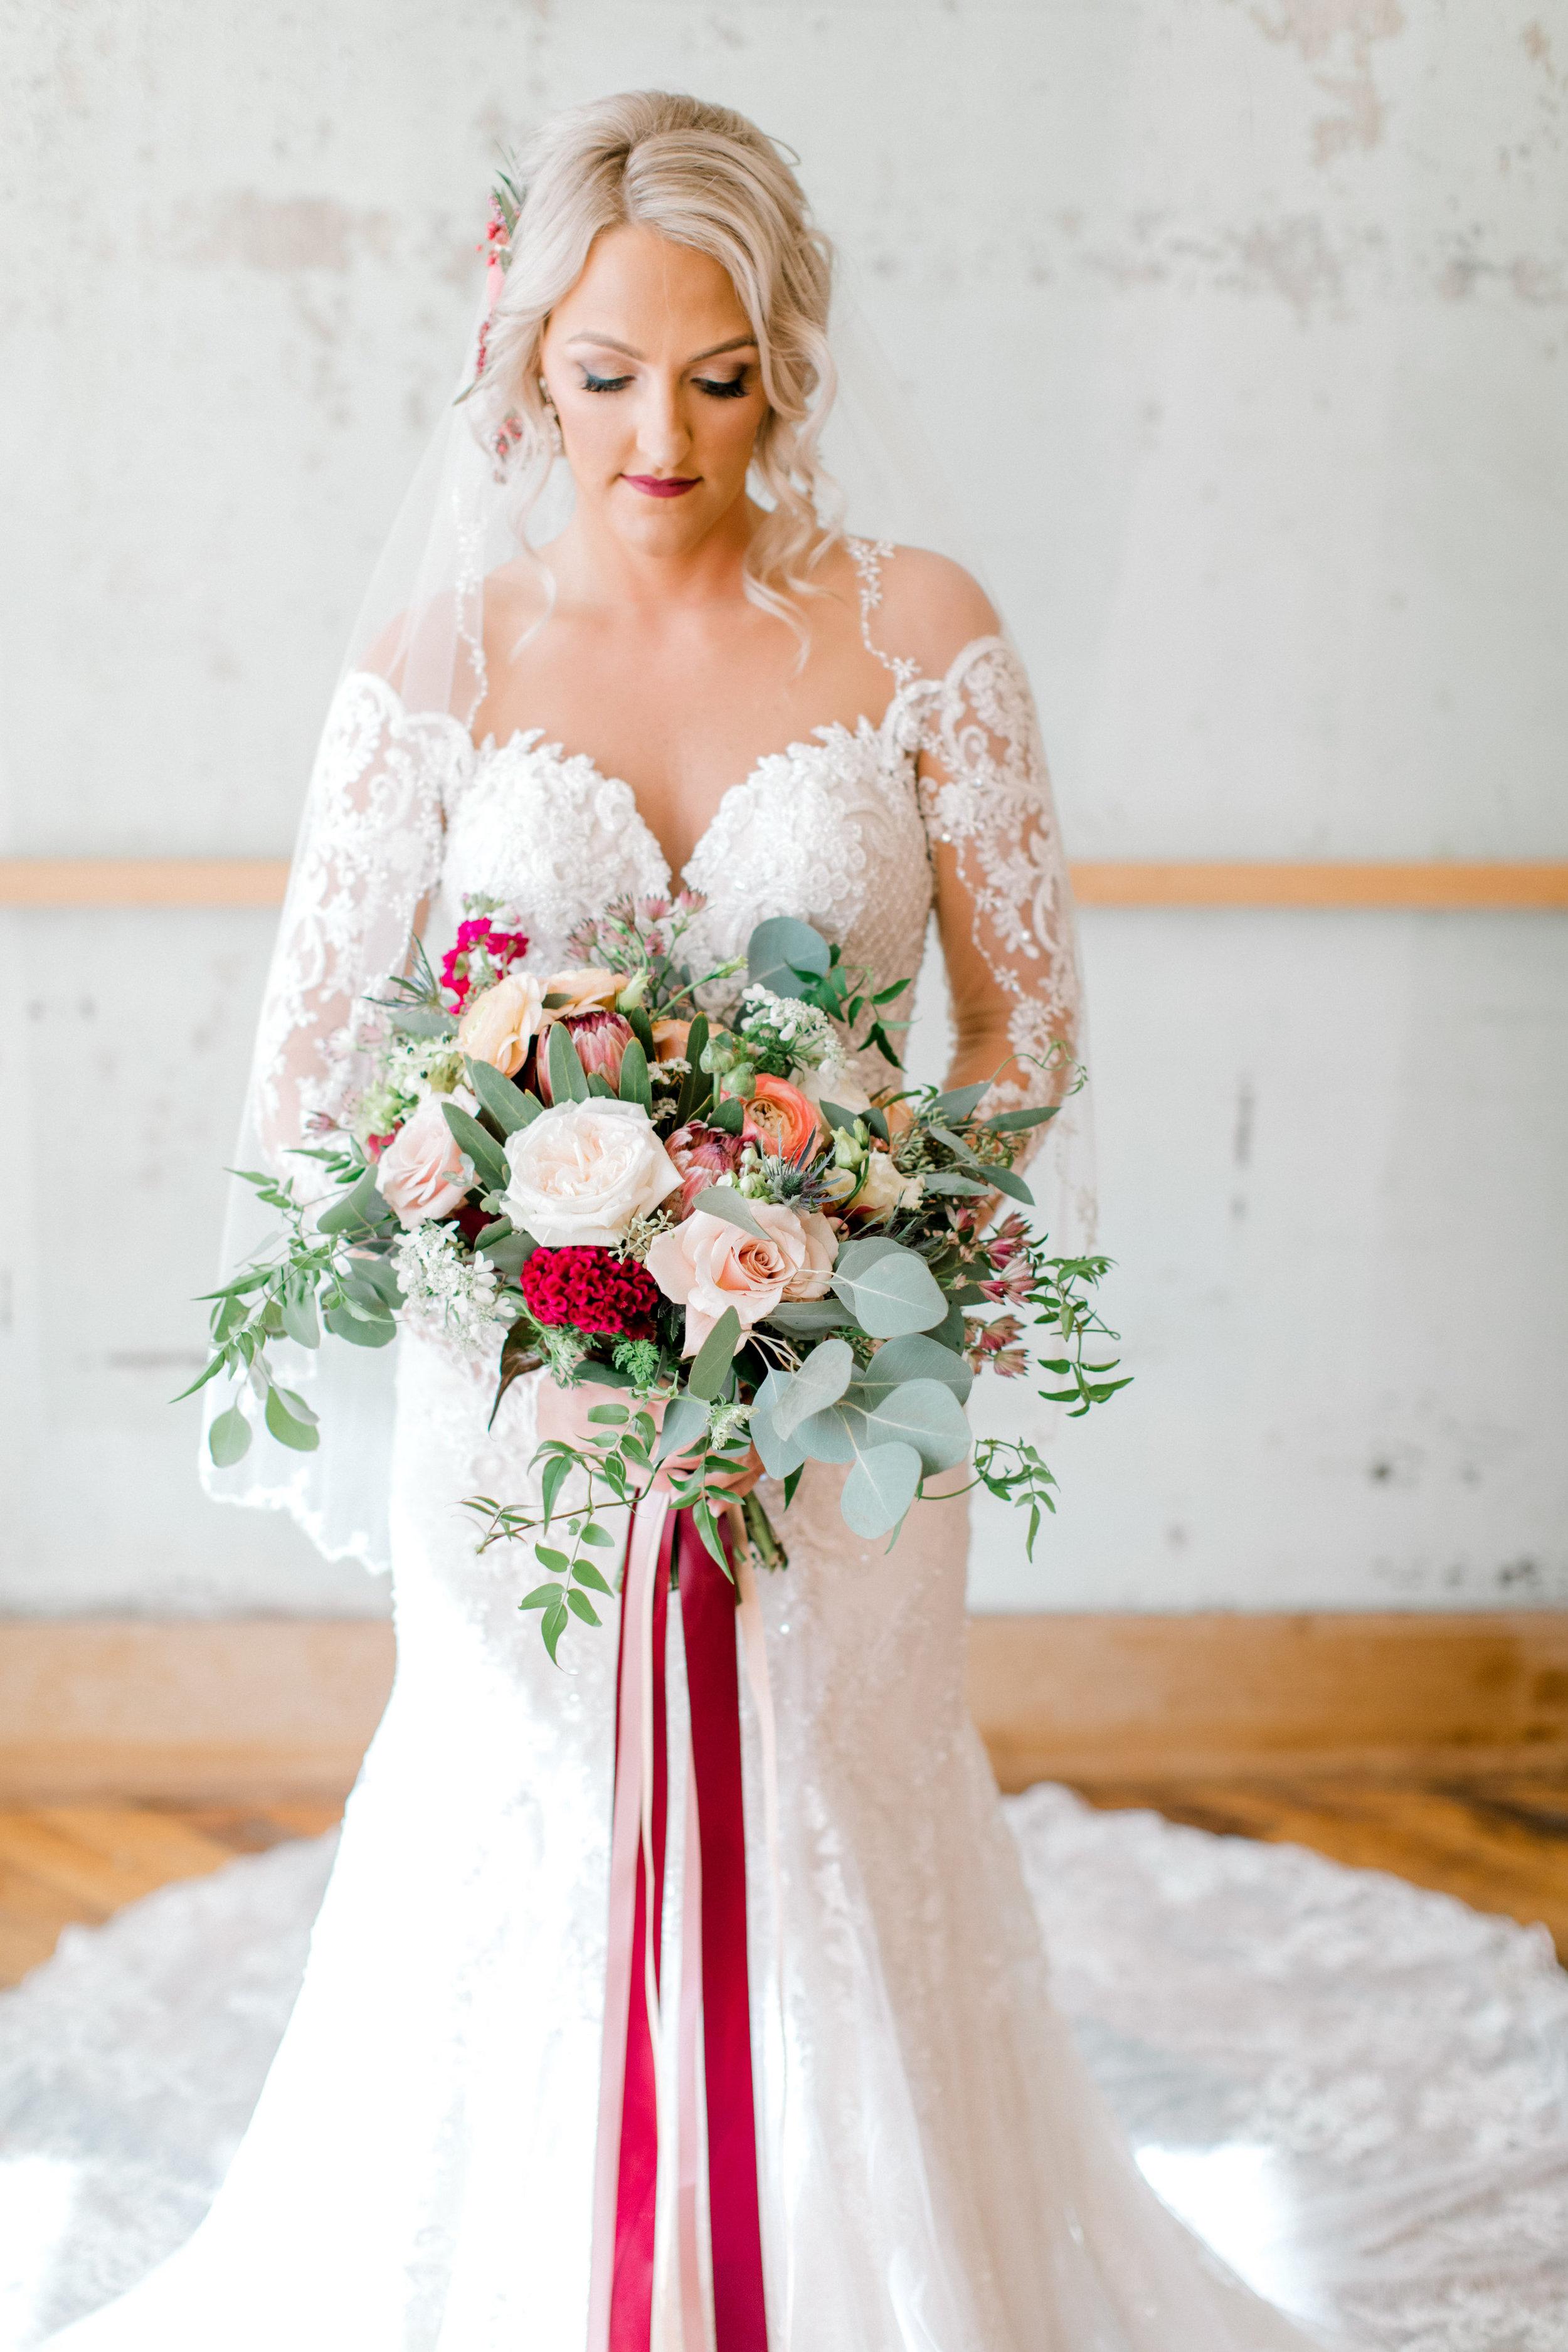 Ryan Alexa Married-Getting Ready First Look-0155.jpg